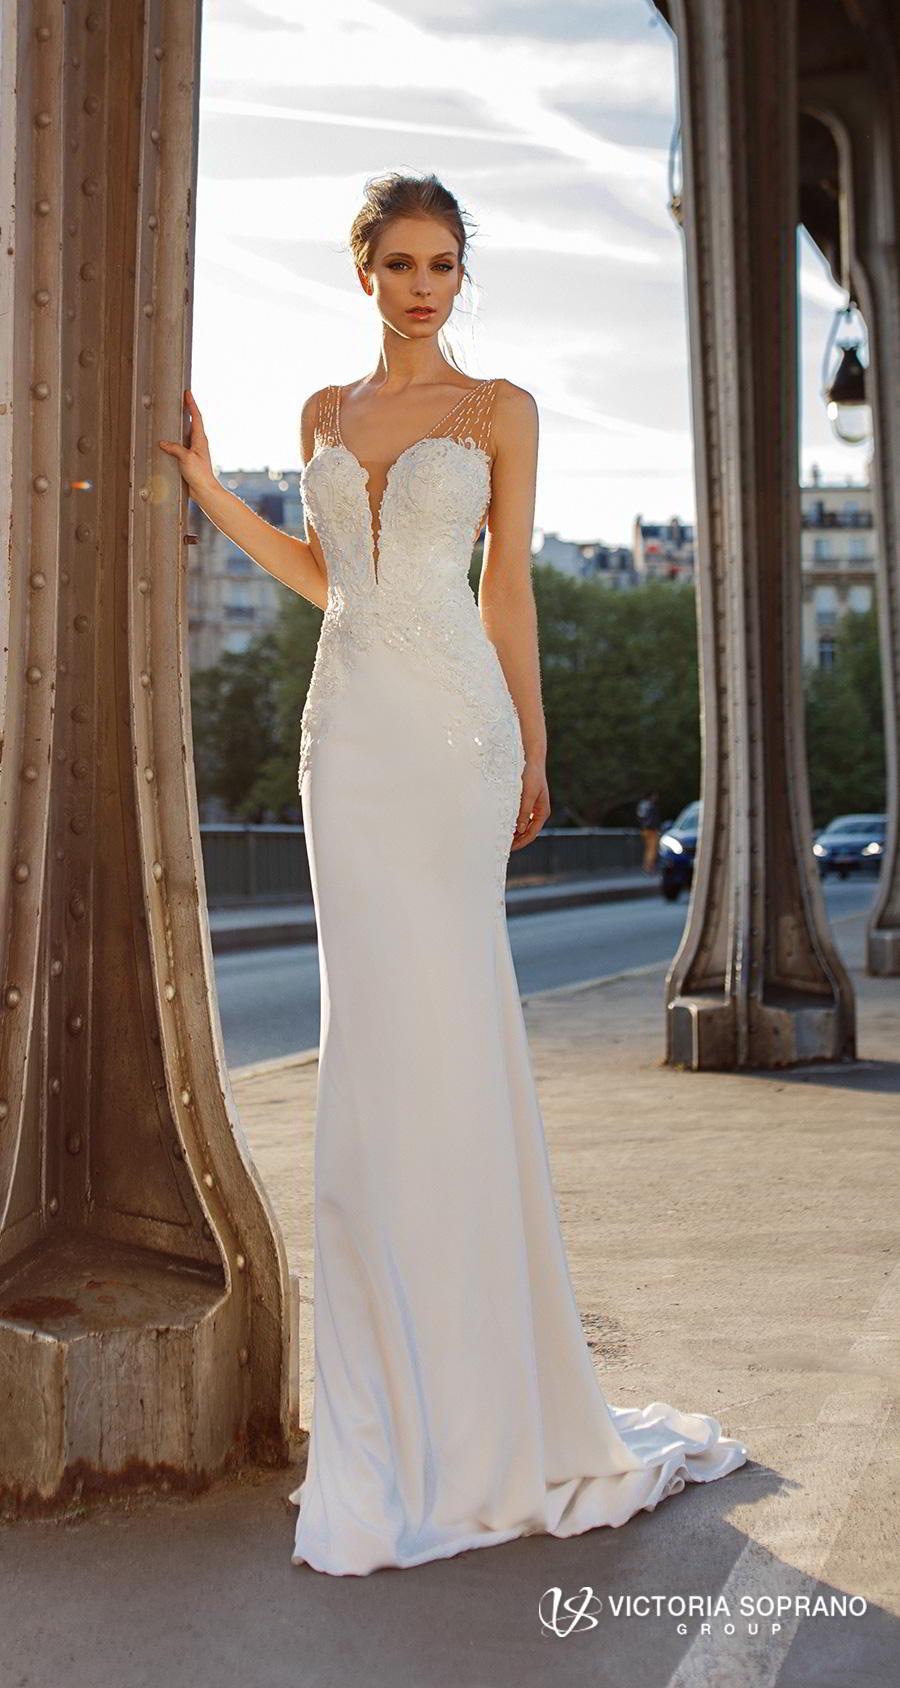 victoria soprano 2019 bridal sleeveless deep plunging v neck heavily embellished bodice elegant sheath wedding dress open v back short train (gustin) mv